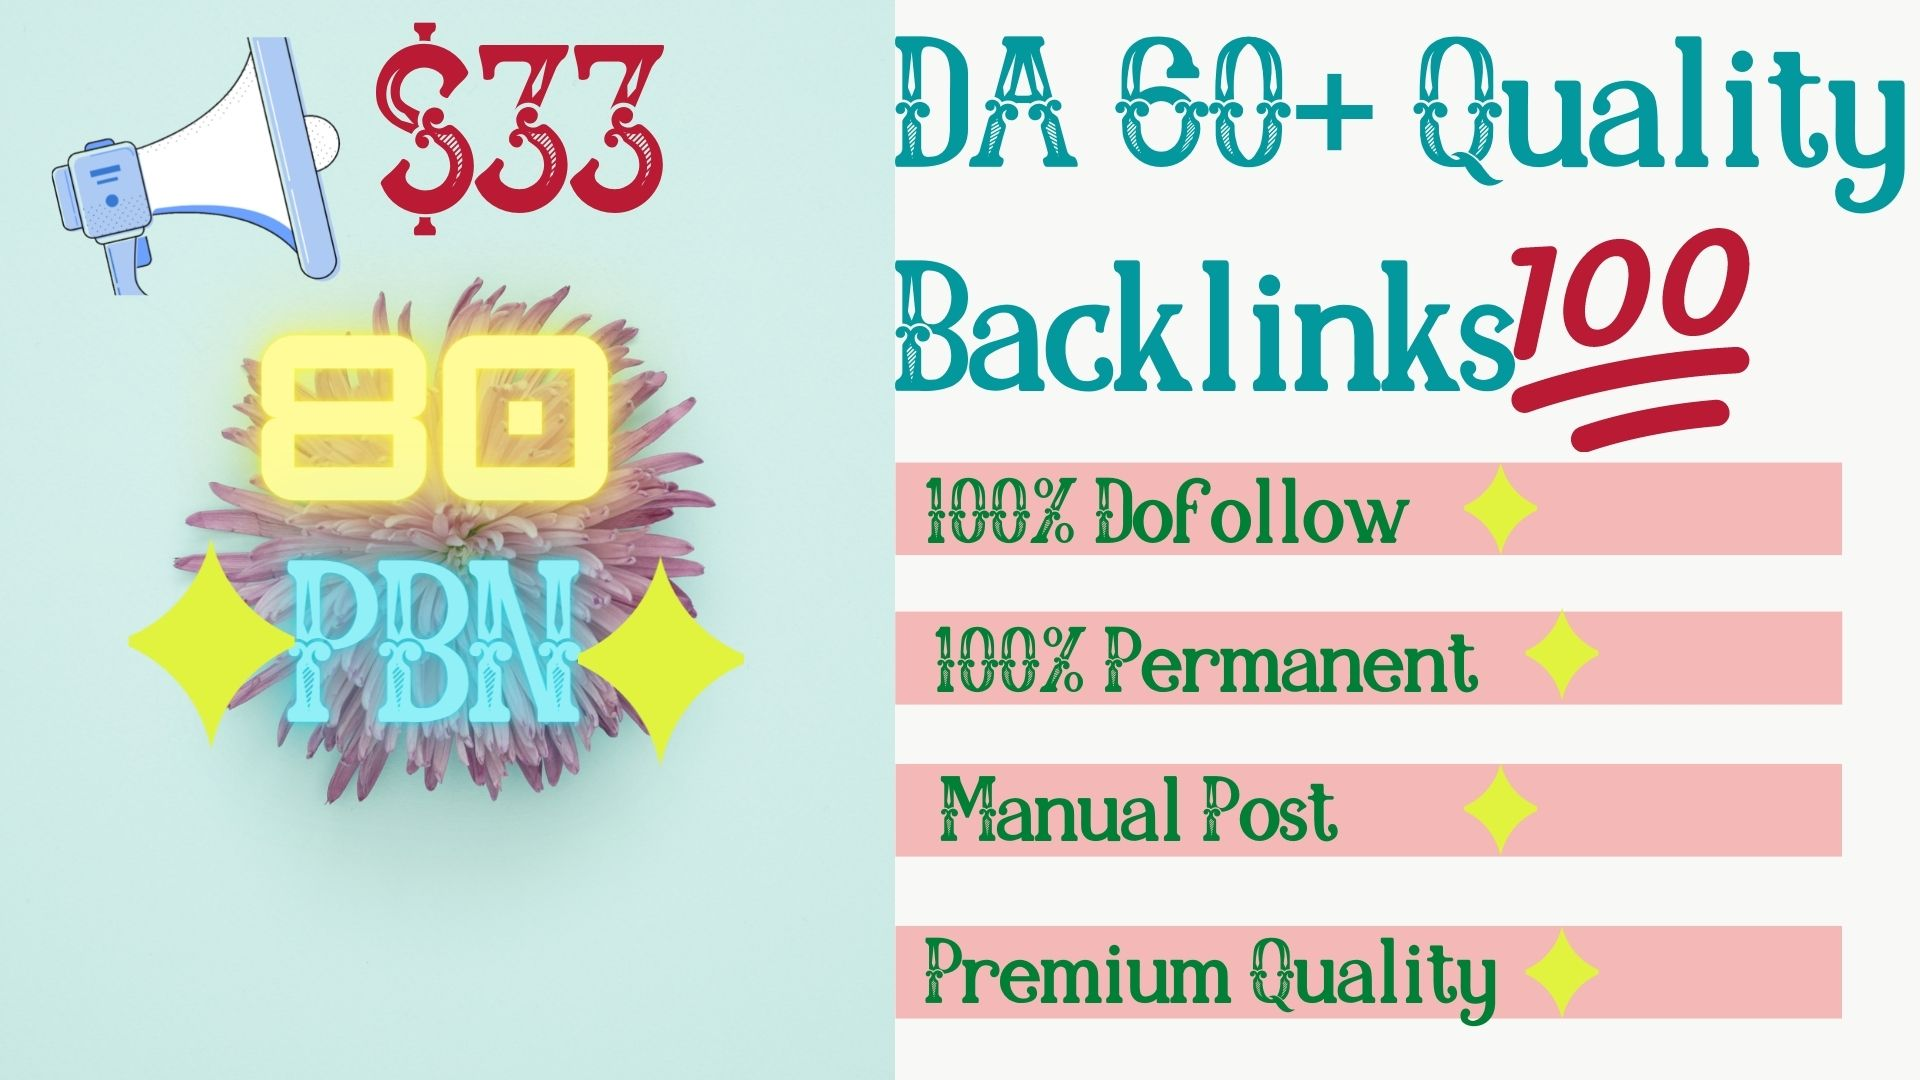 Get 80 High Quality DA 65+ Permanent HomePage Dofollow PBN Links.